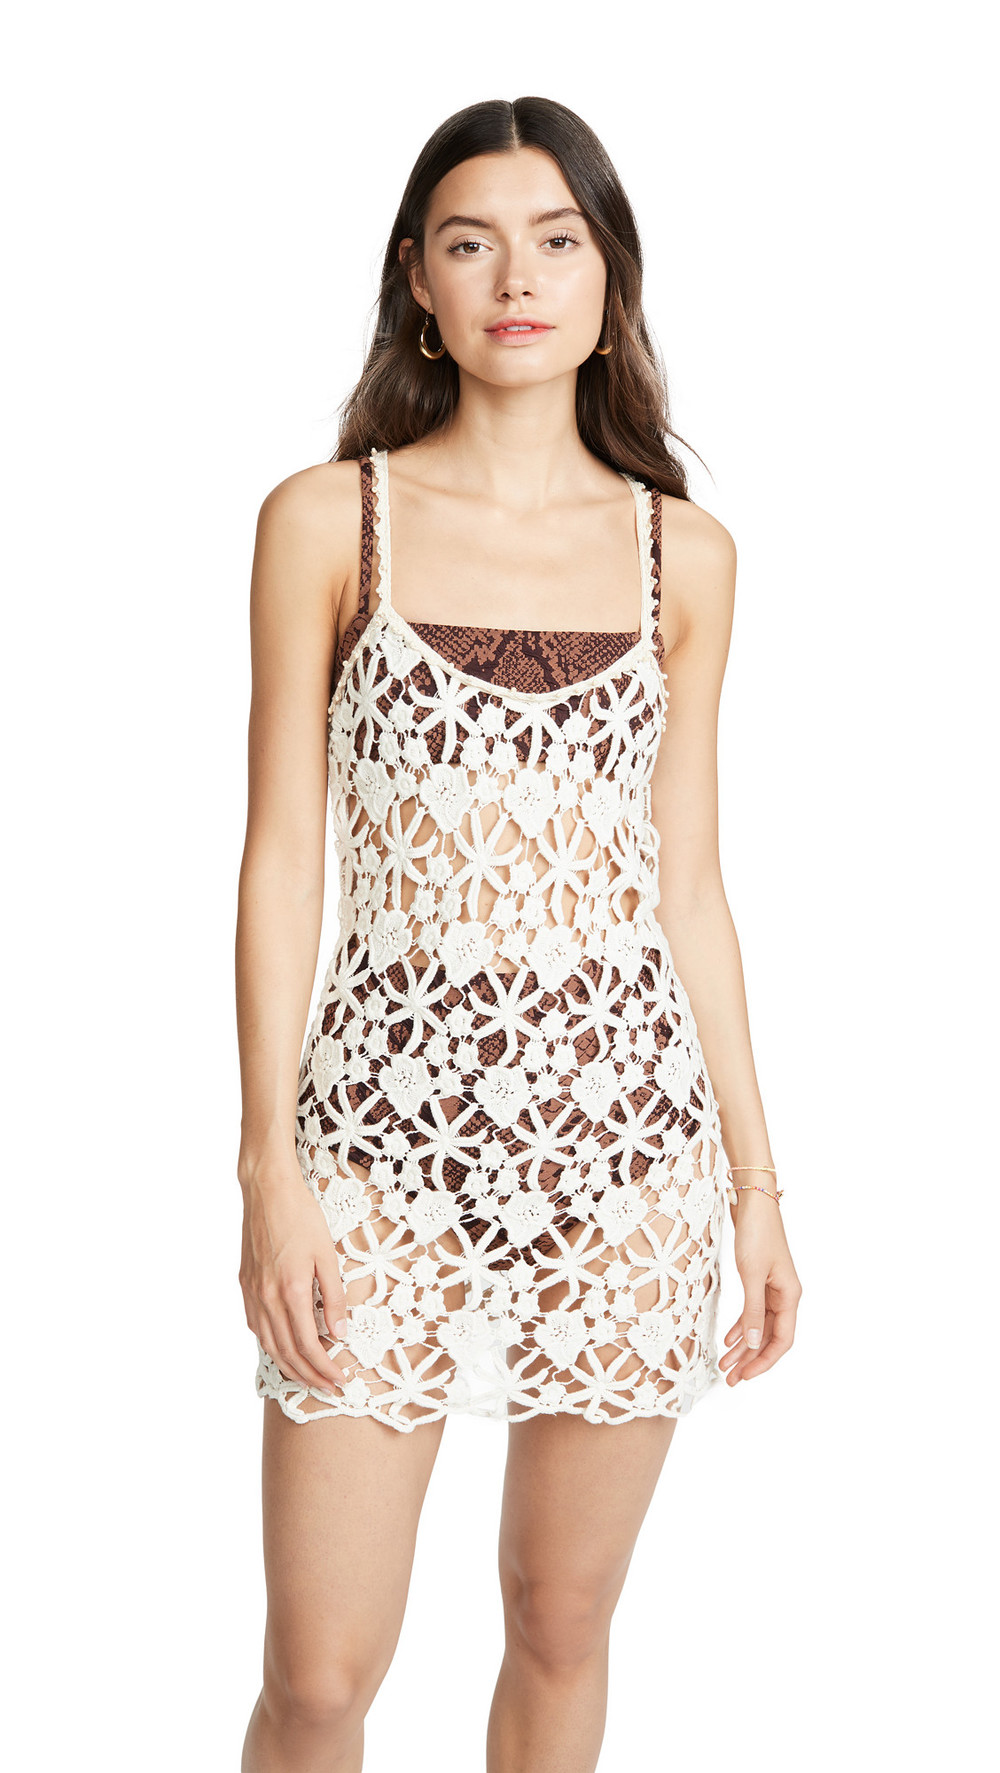 Ellejay Liz Dress in cream